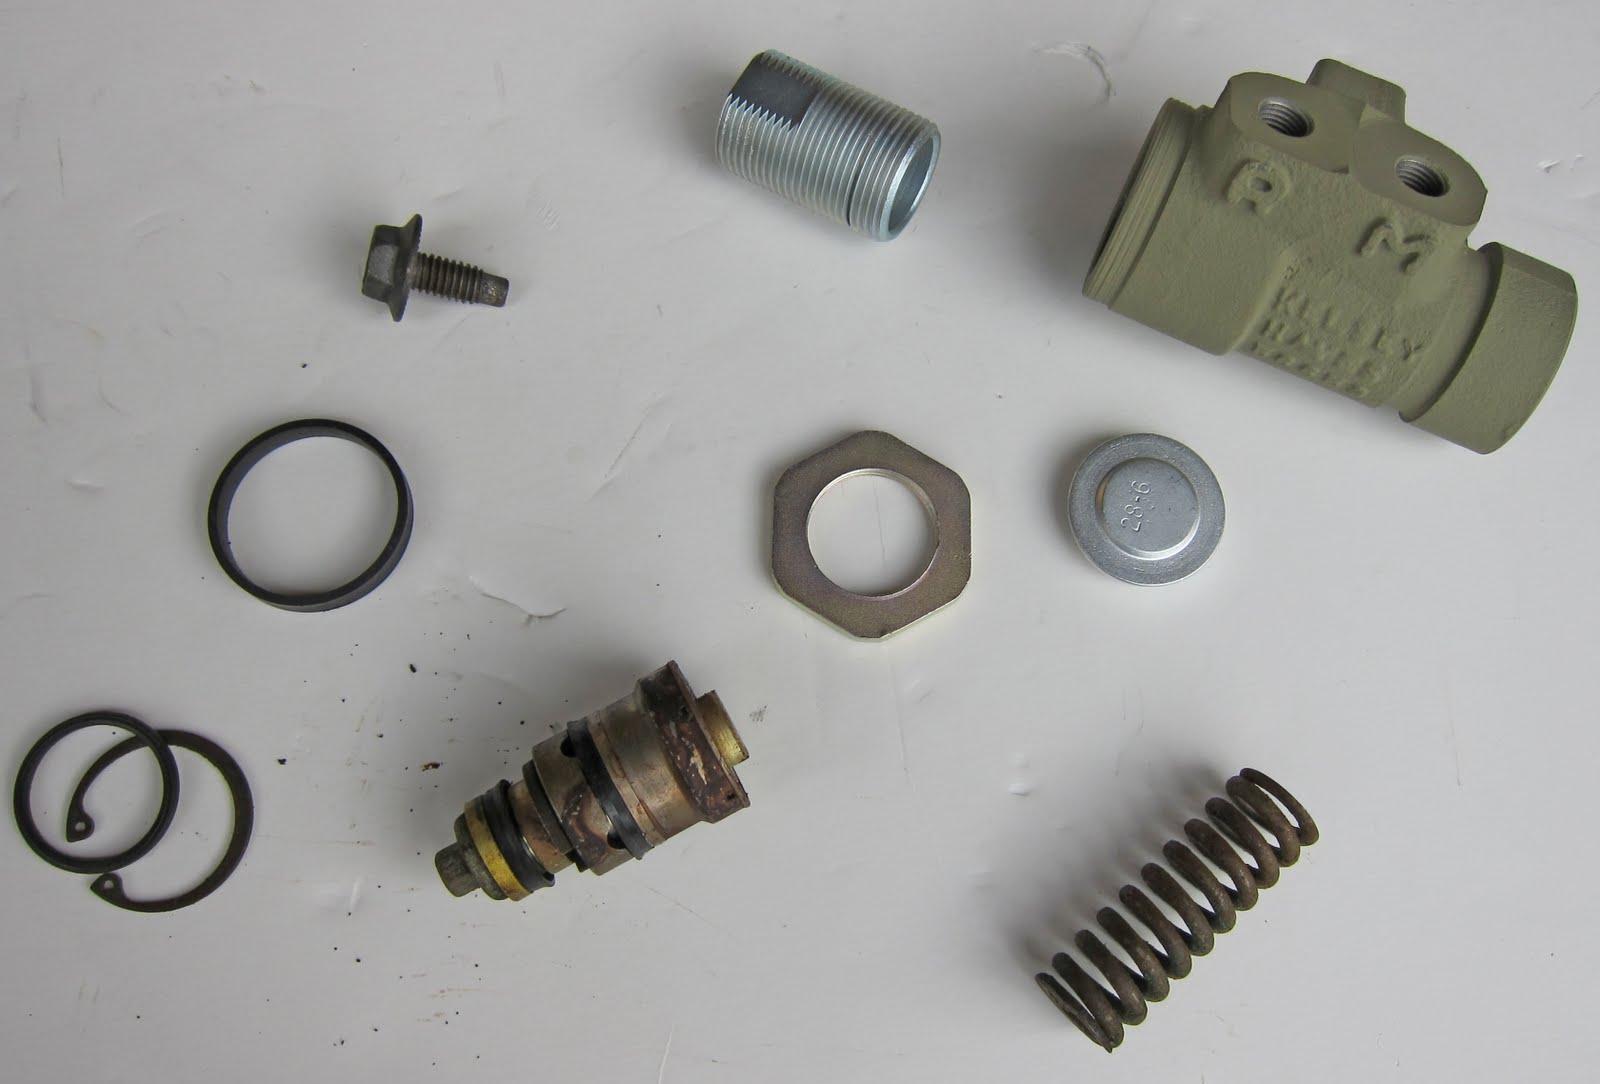 Wiring Diagram For Ke Proportioning Valve Thermostat Proportional Engine Virginia Clic Mustang Blog 1965 66 Disc Brake On